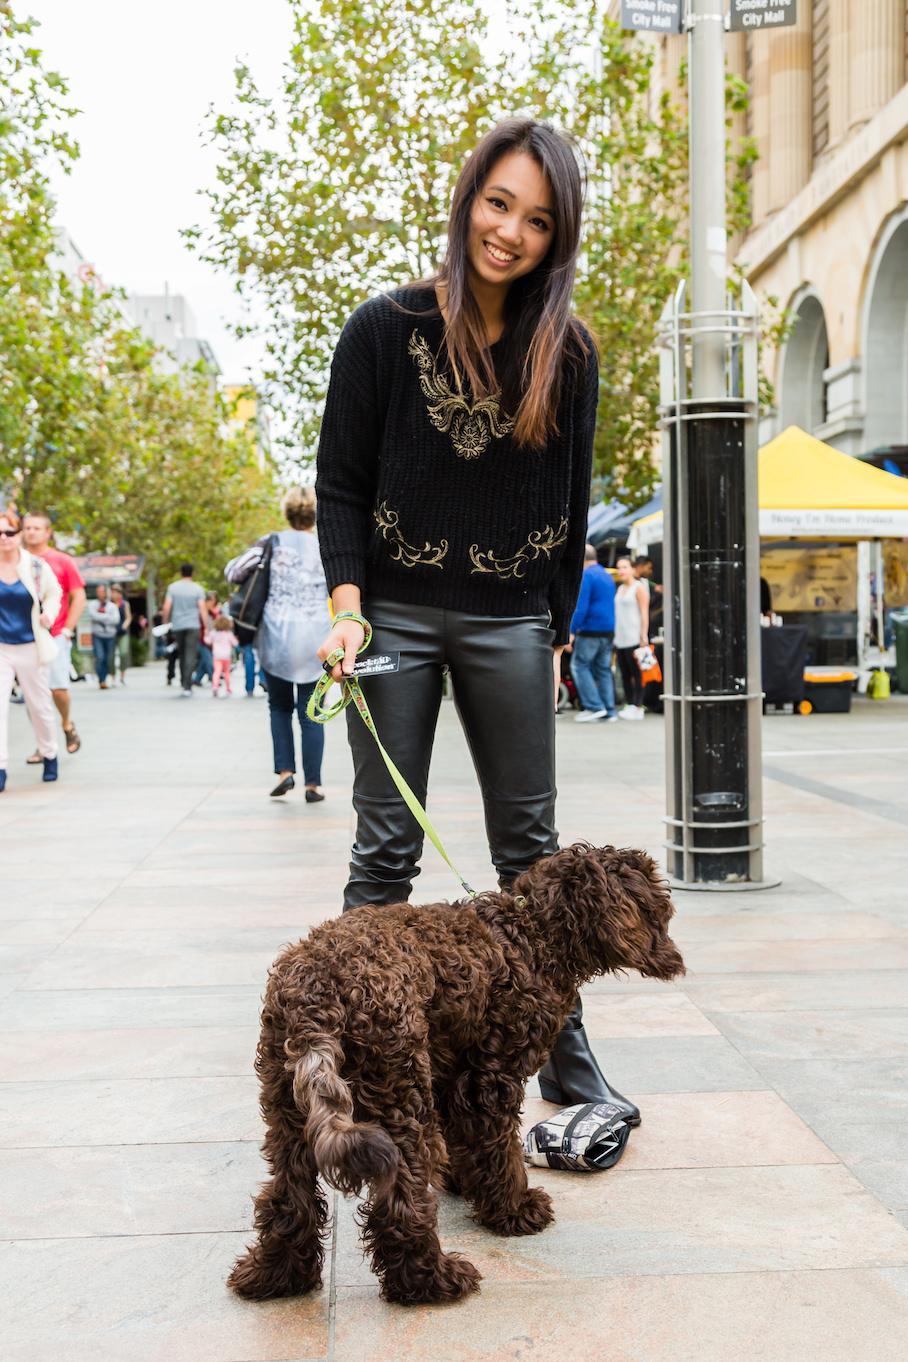 "WA: Melody Ip, Verteranarian, Perth city. ""I love my animals."" Photo: <a href=""http://www.rahstudios.com.au/street-style.html/"" target=""_blank"">Alain Quah</a>"